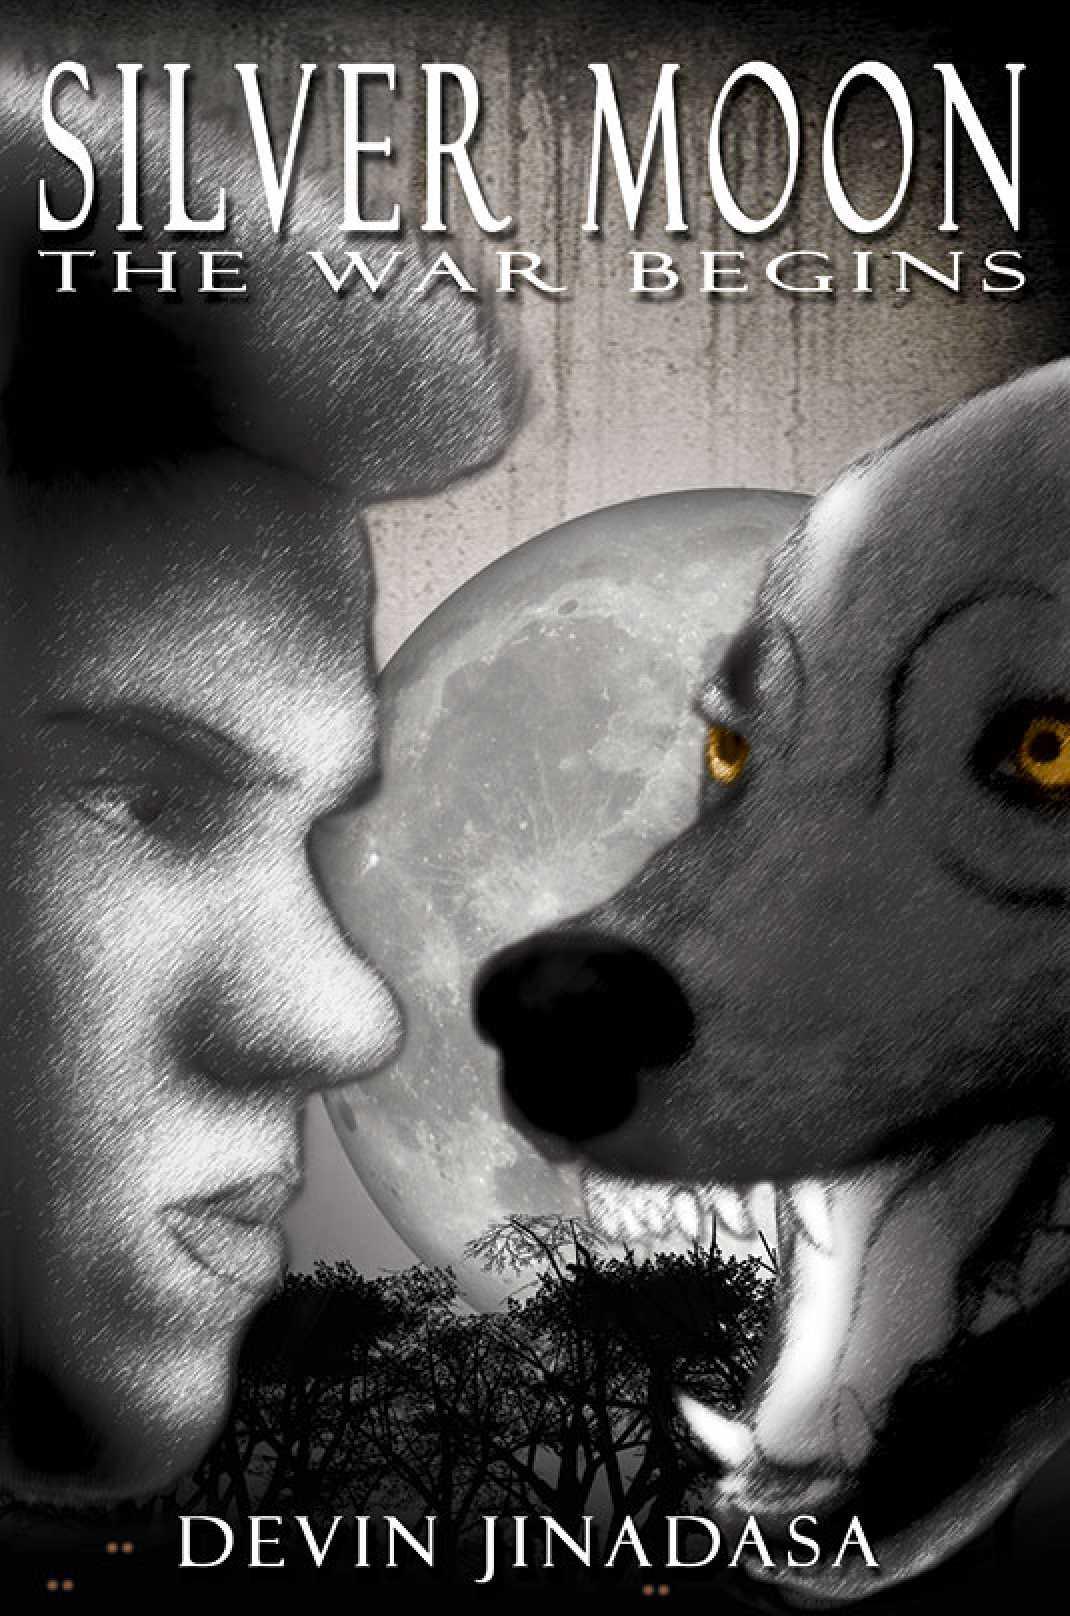 Silver Moon: The War Begins